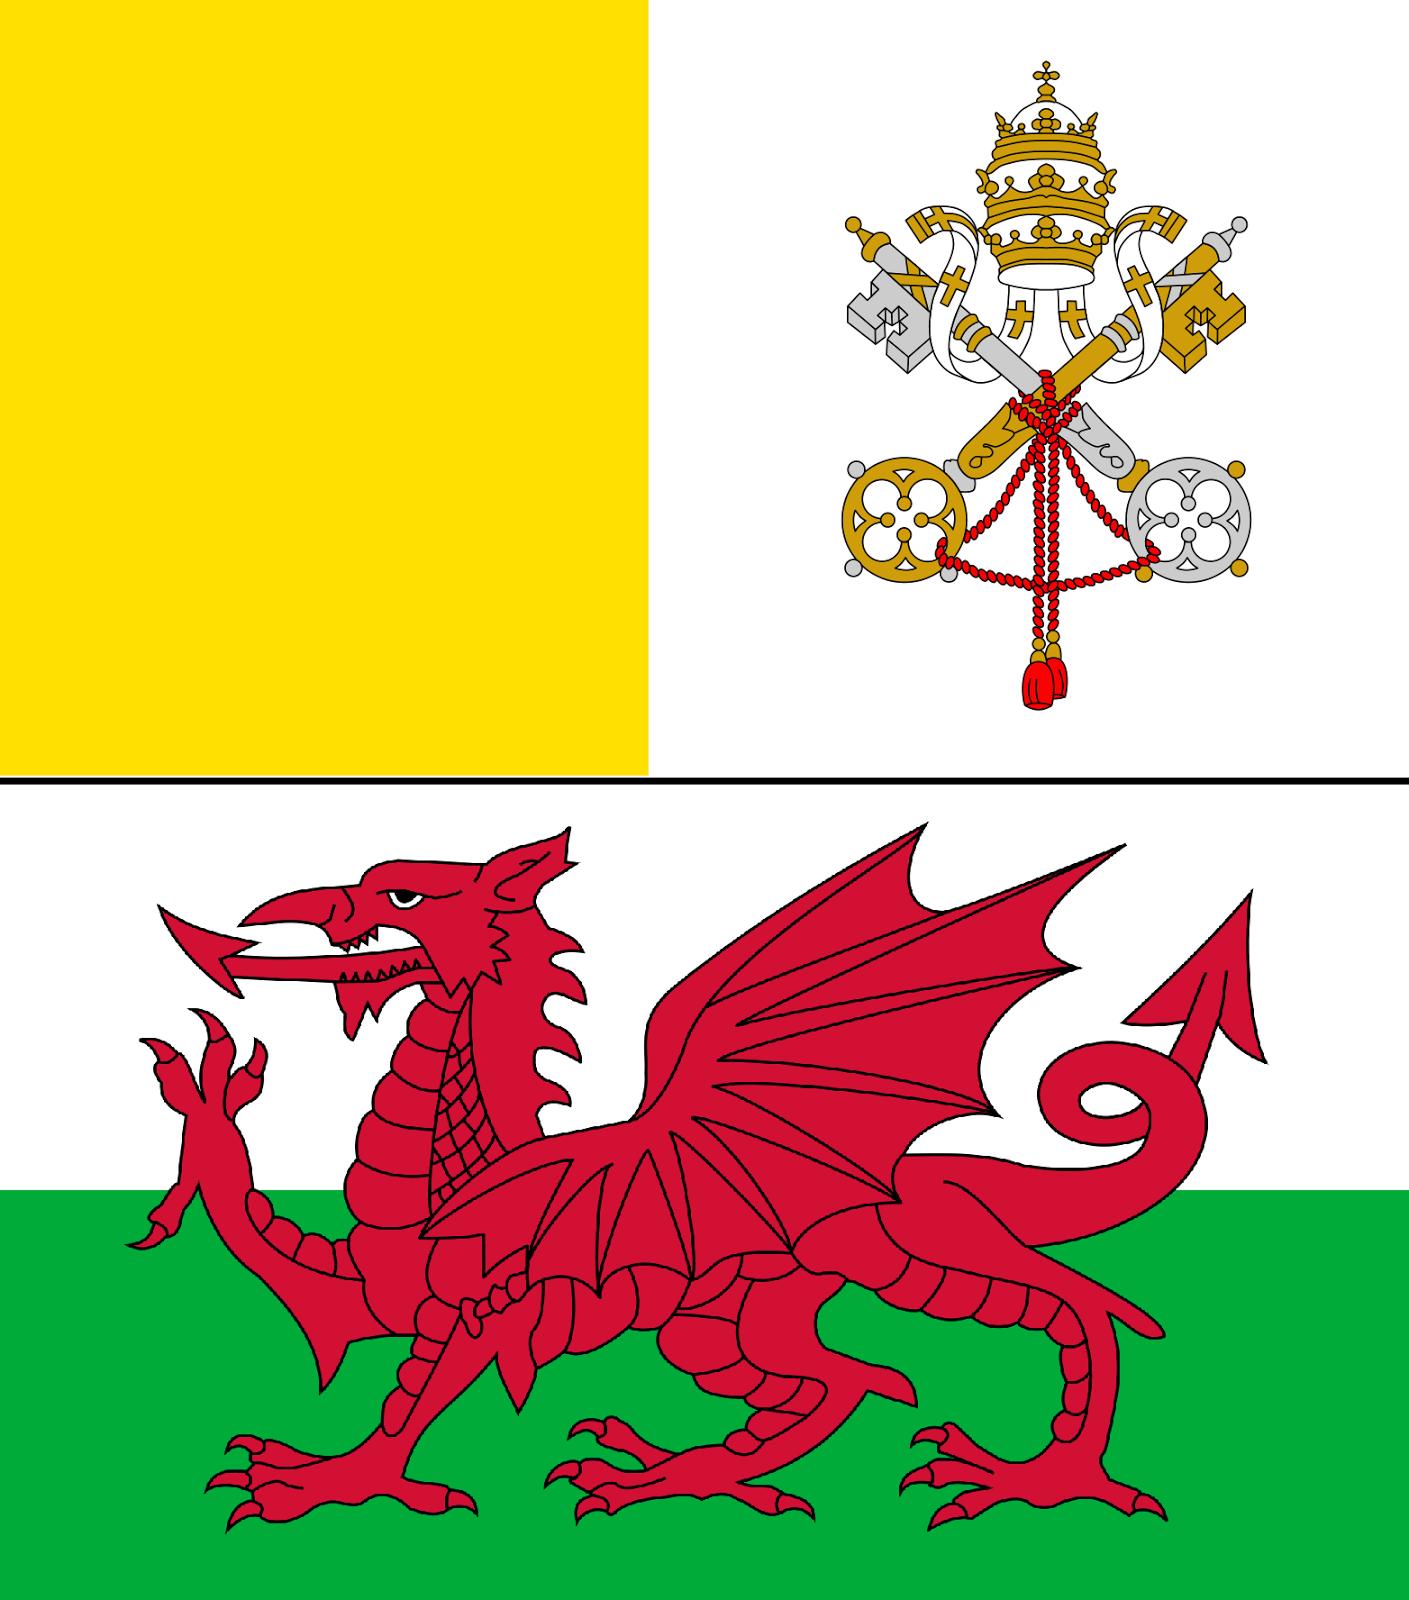 Vatican & Welsh Flags